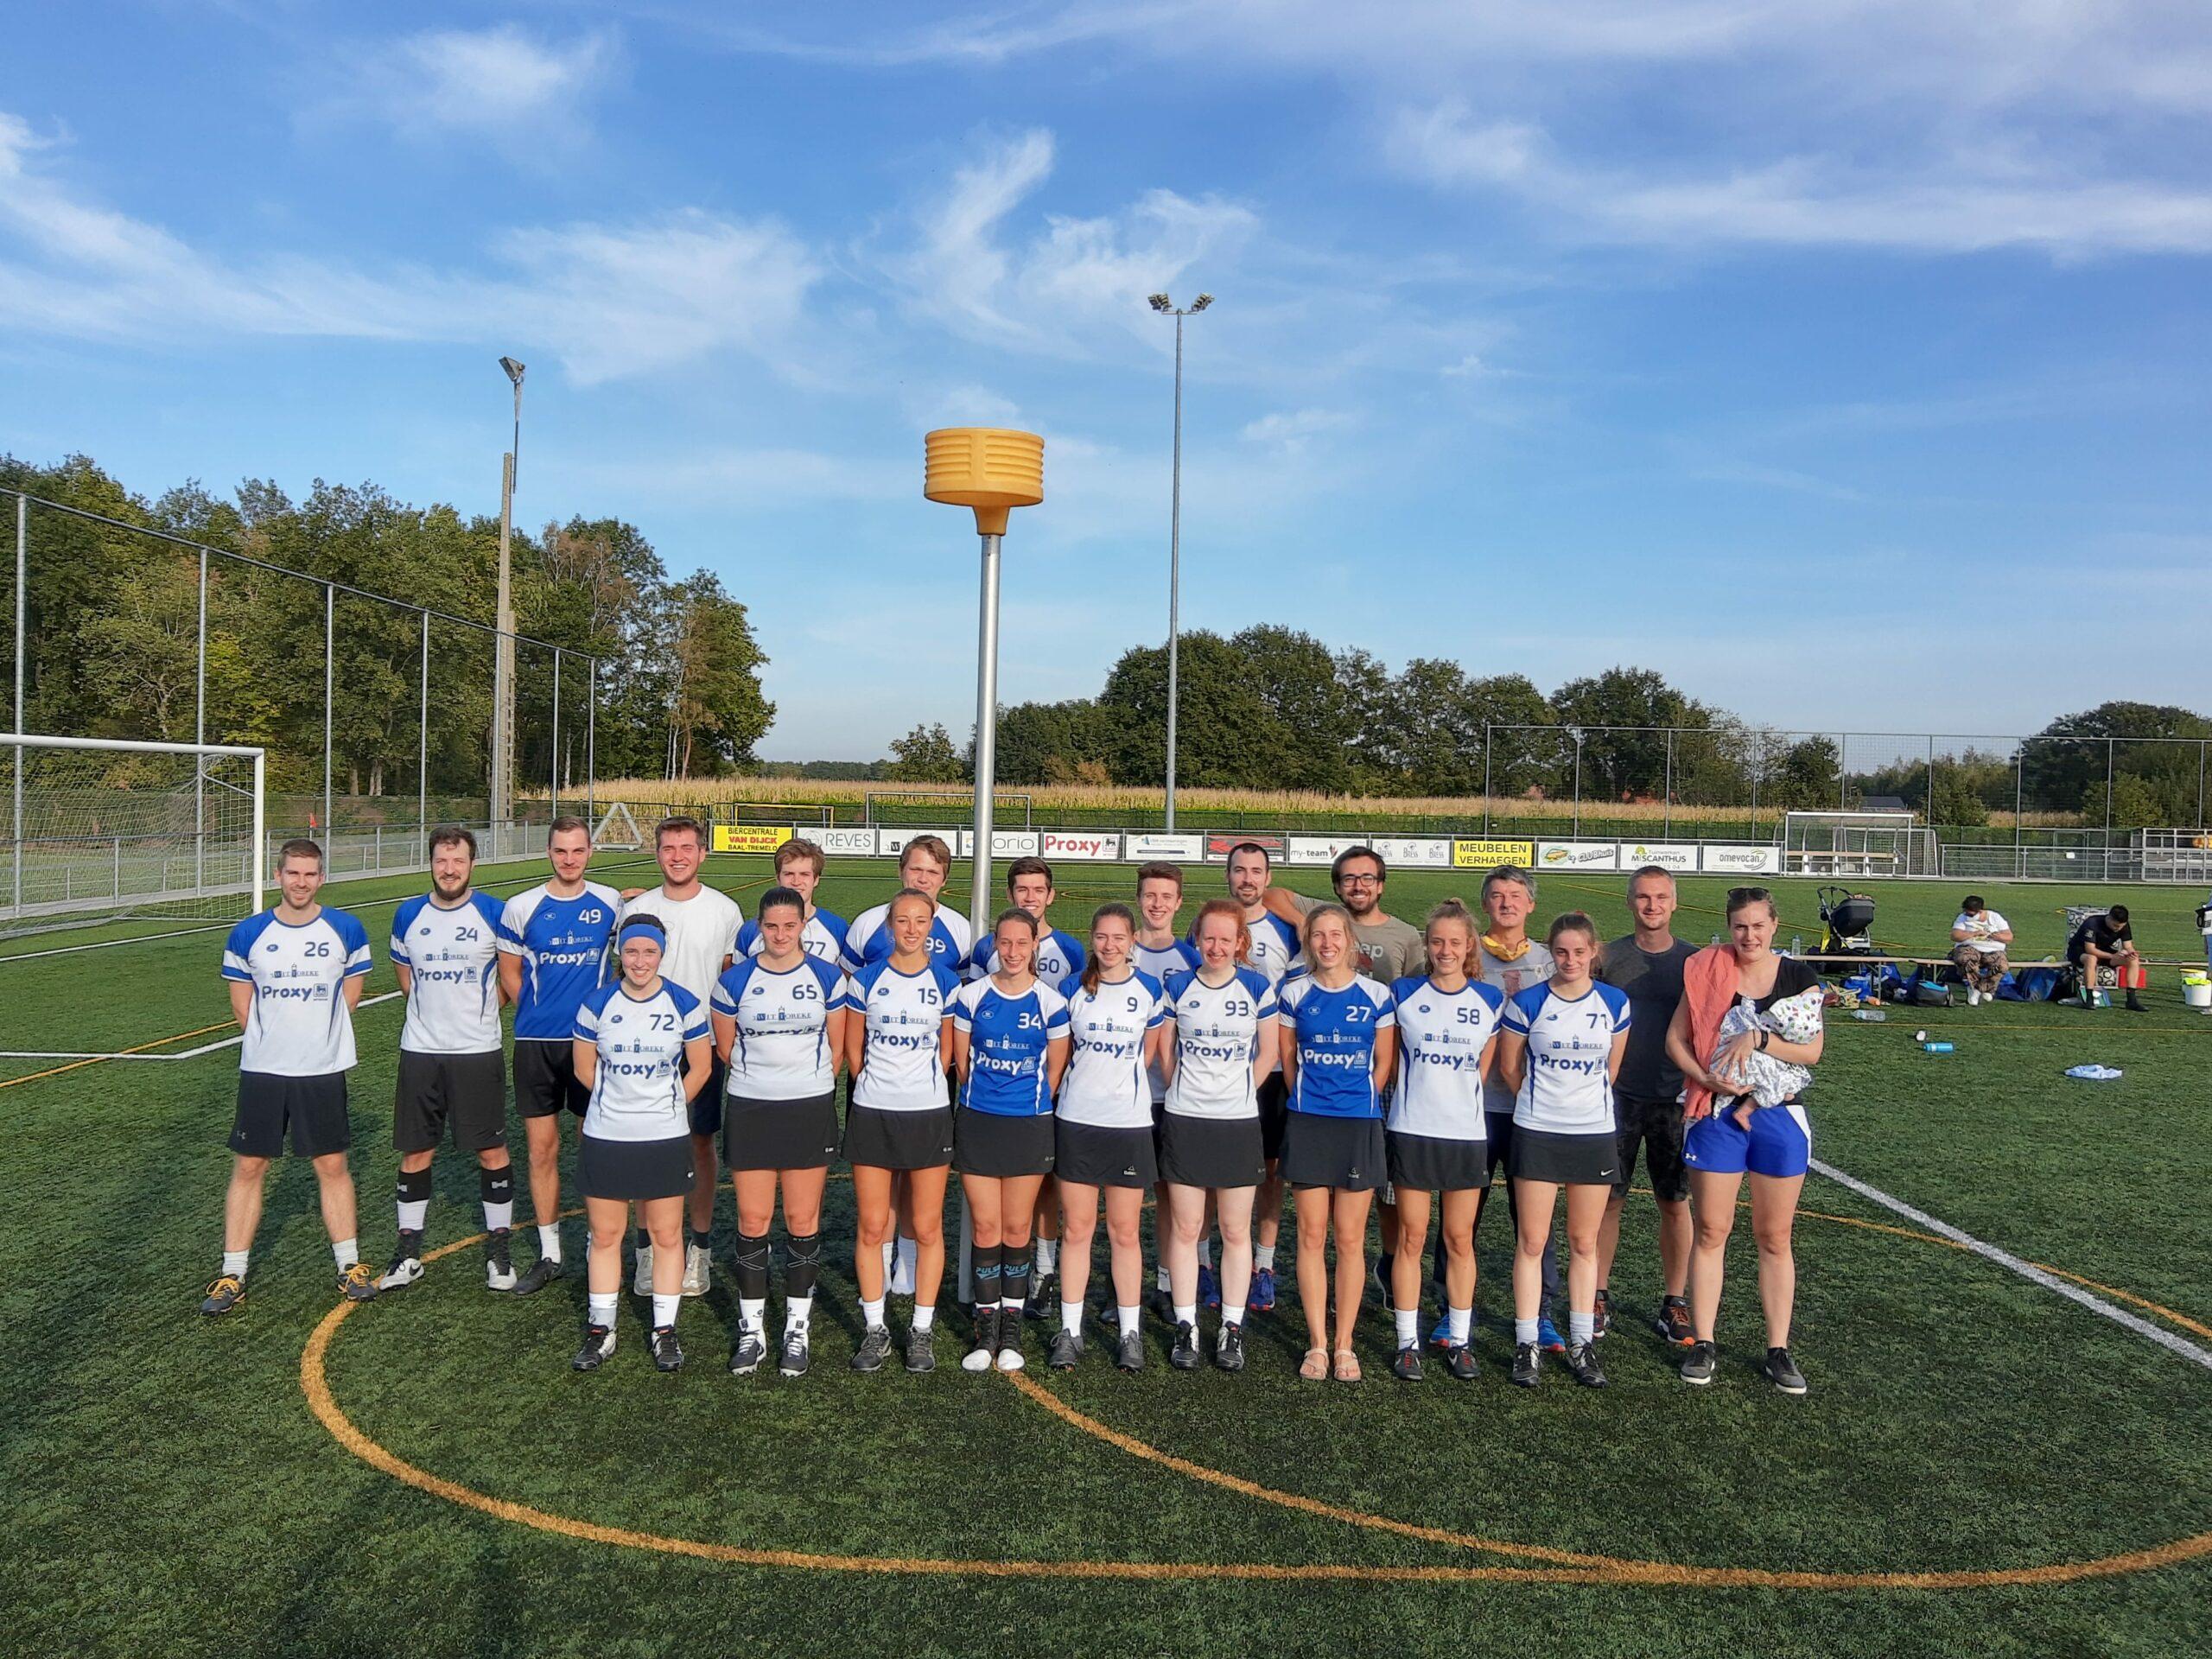 KCBJ Betekom wint seizoensopener in Hoofdklasse 1